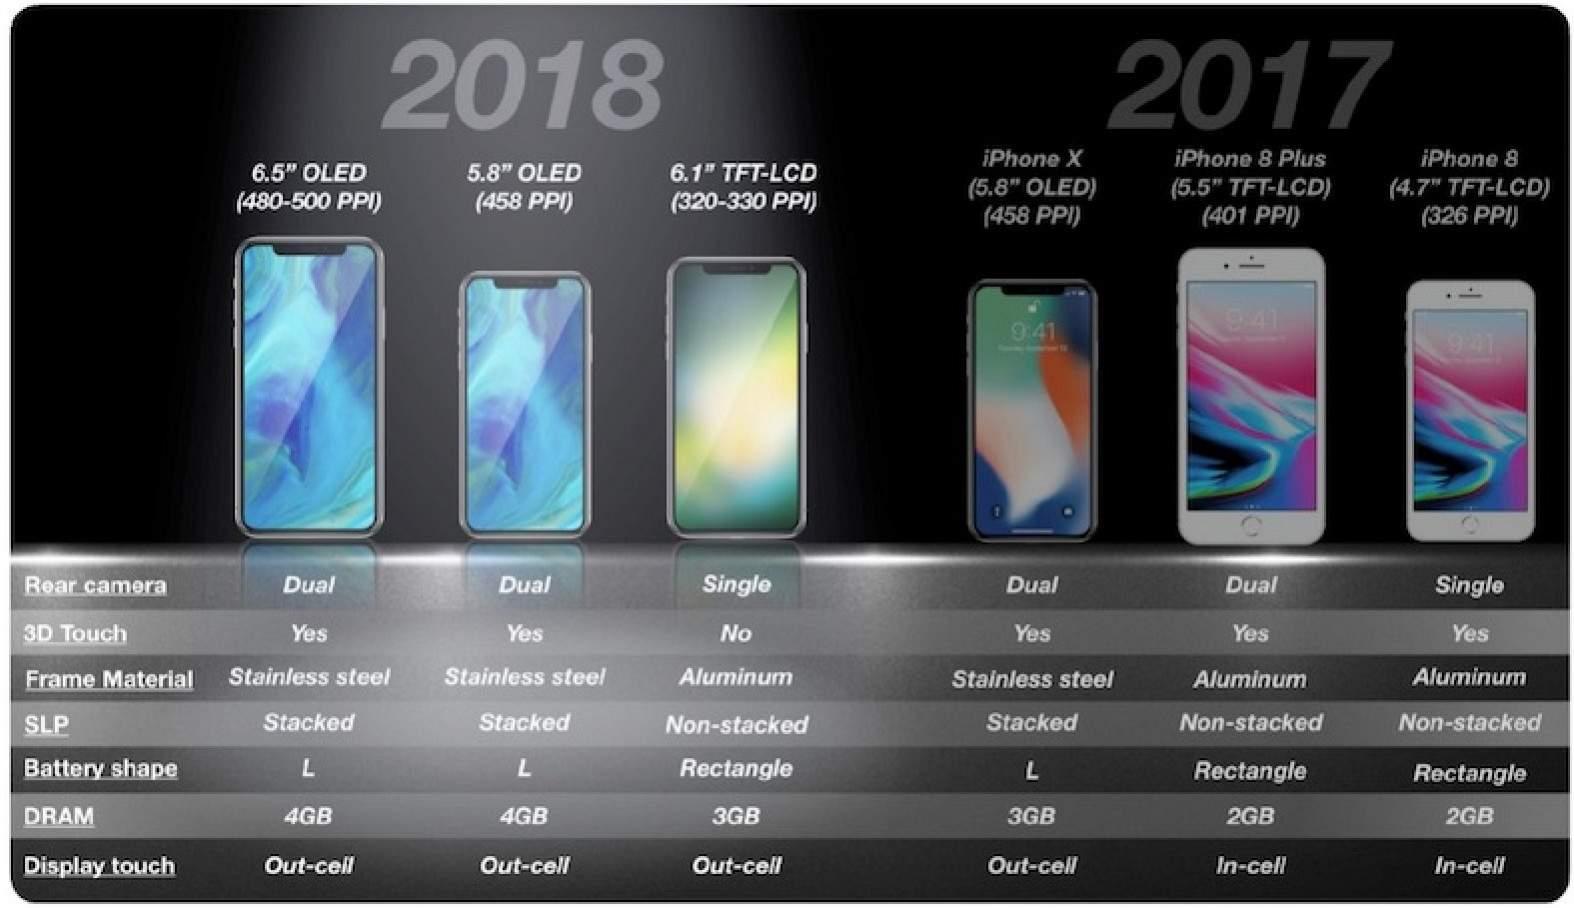 Mirip iPhone 8 Plus dari Segi Ukuran ...